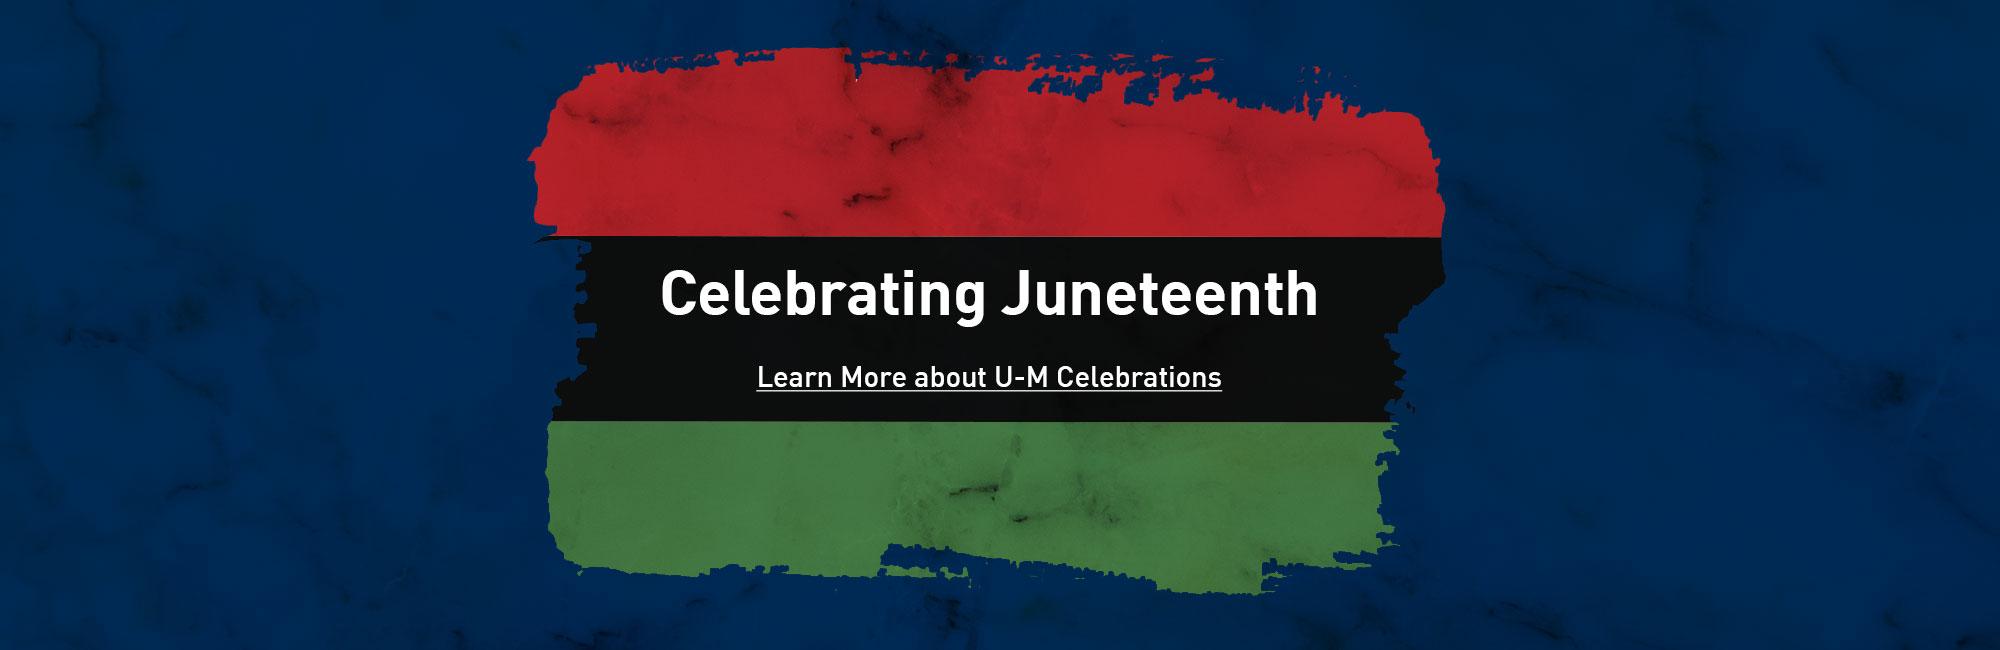 Celebrating Juneteenth. Learn more about U-M celebrations.